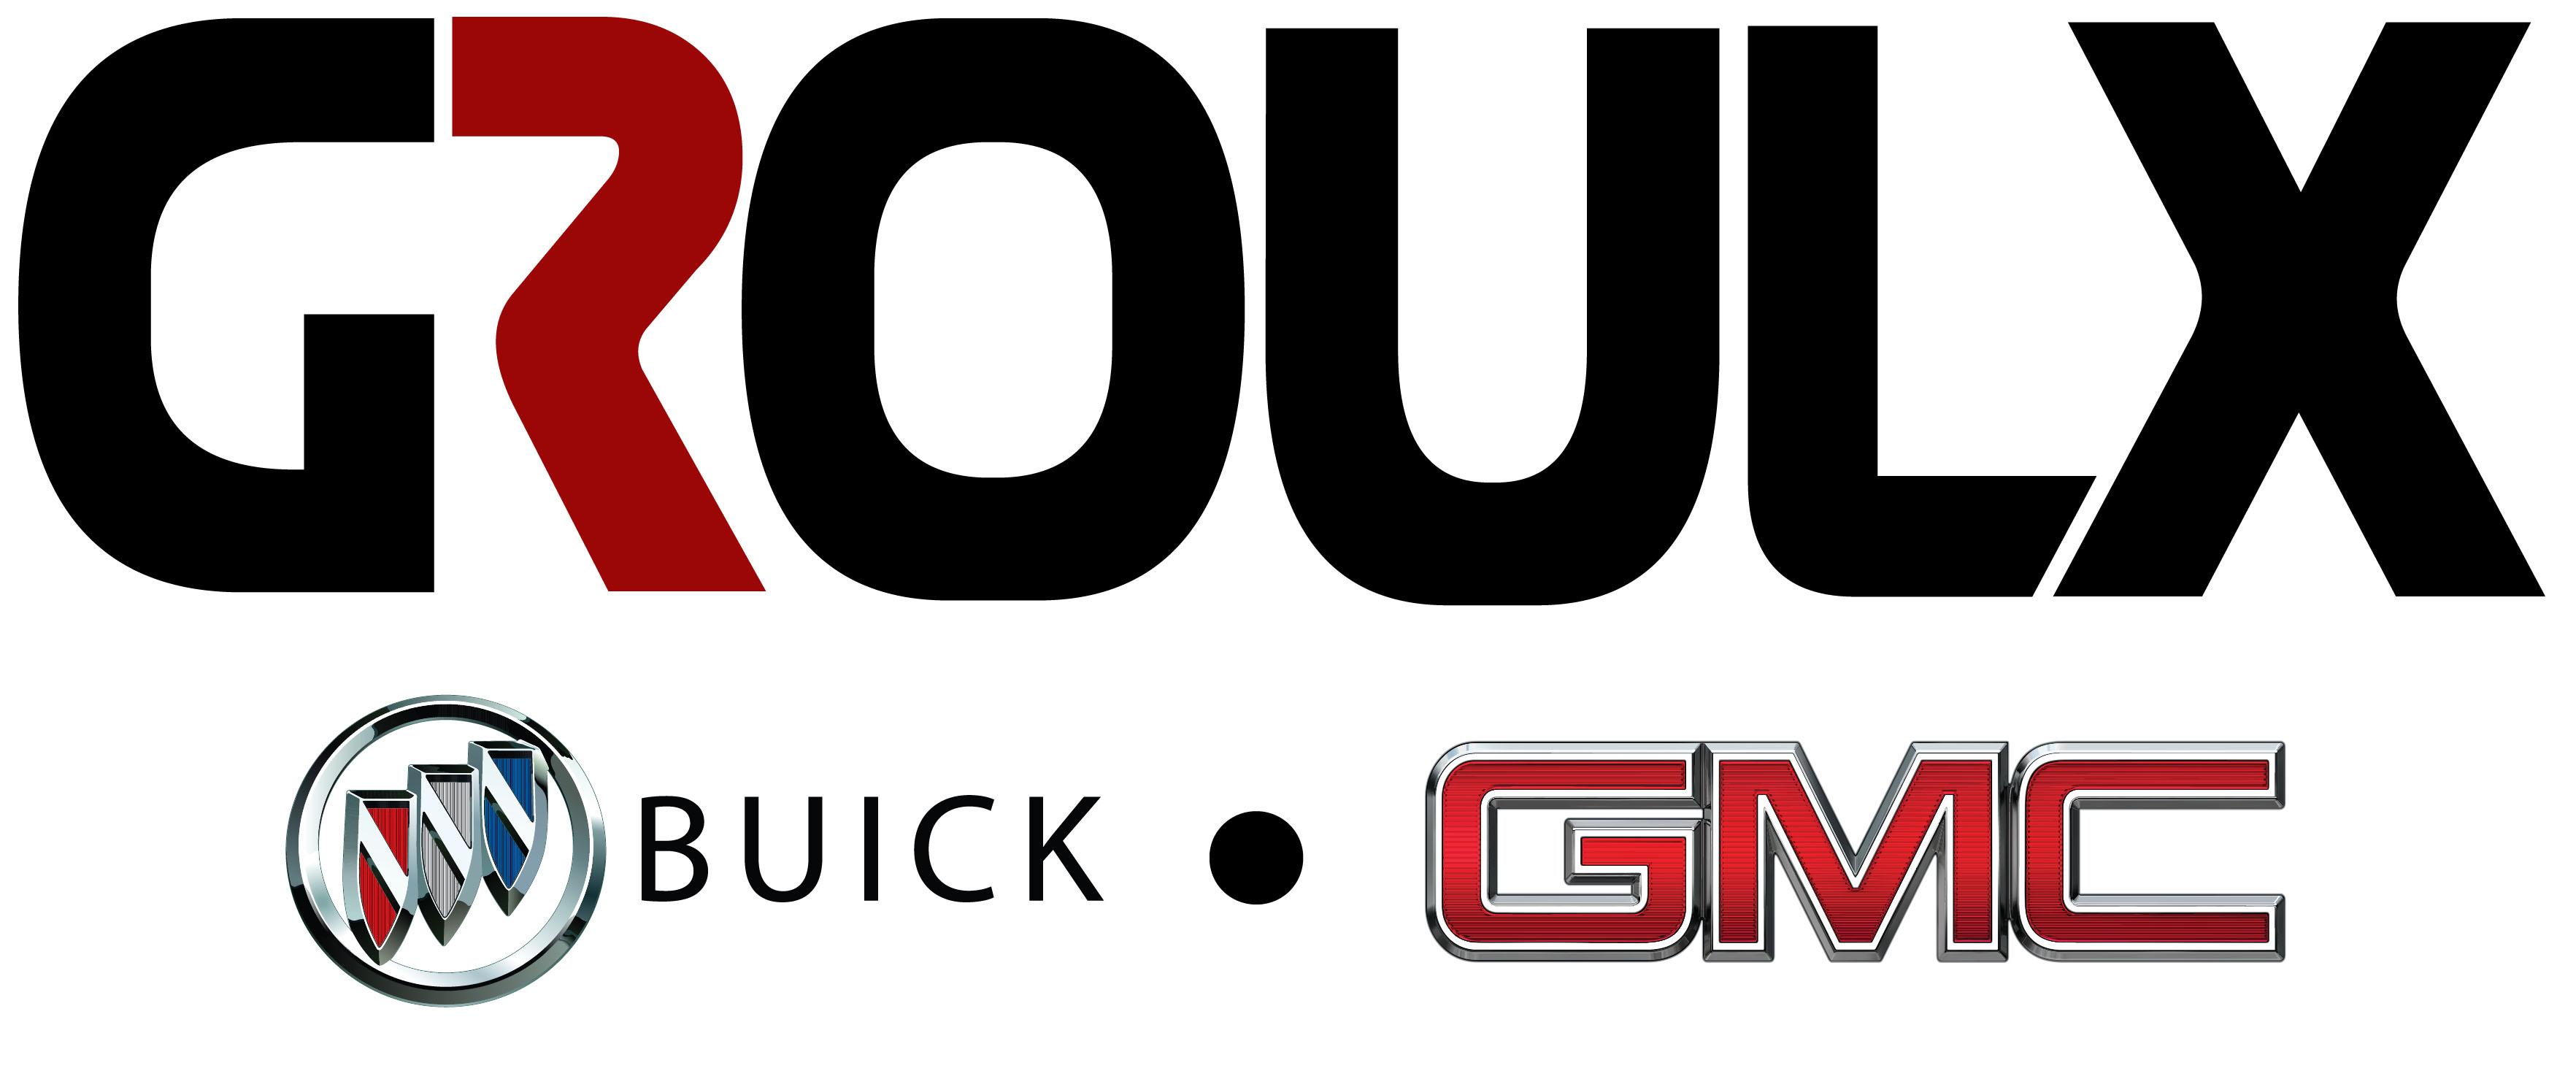 Groulx Buick GMC